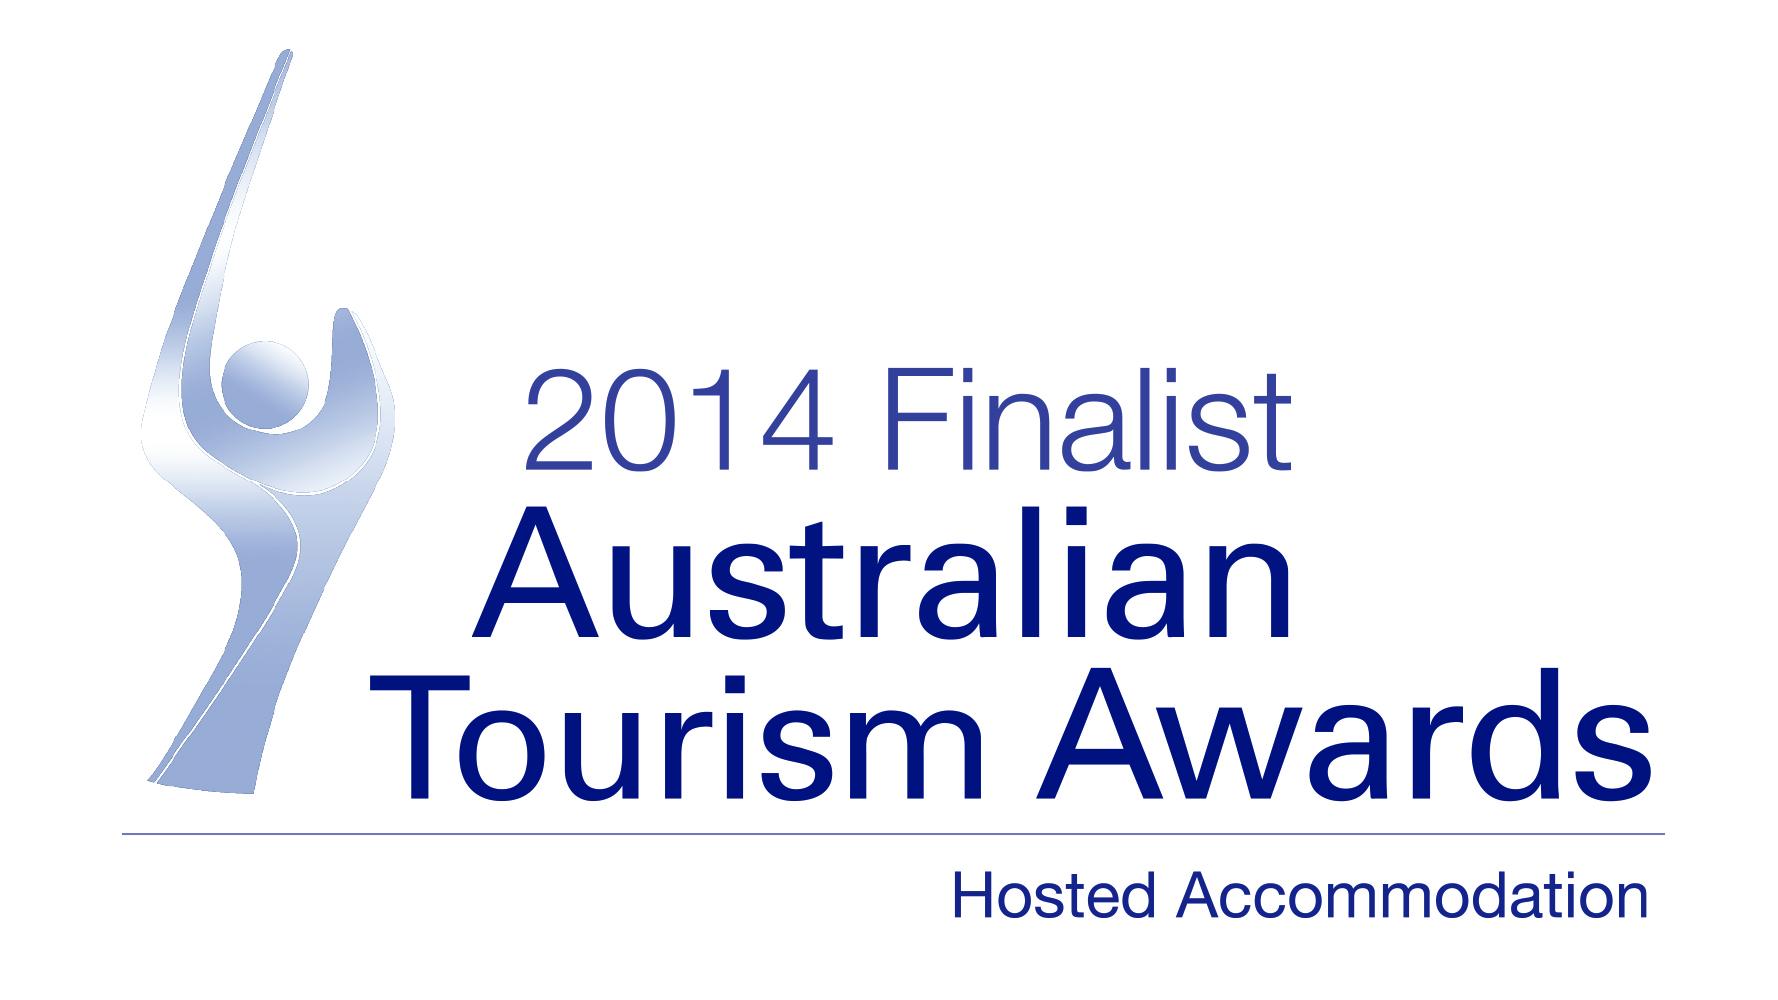 2014 Finalist Australian Tourism Awards